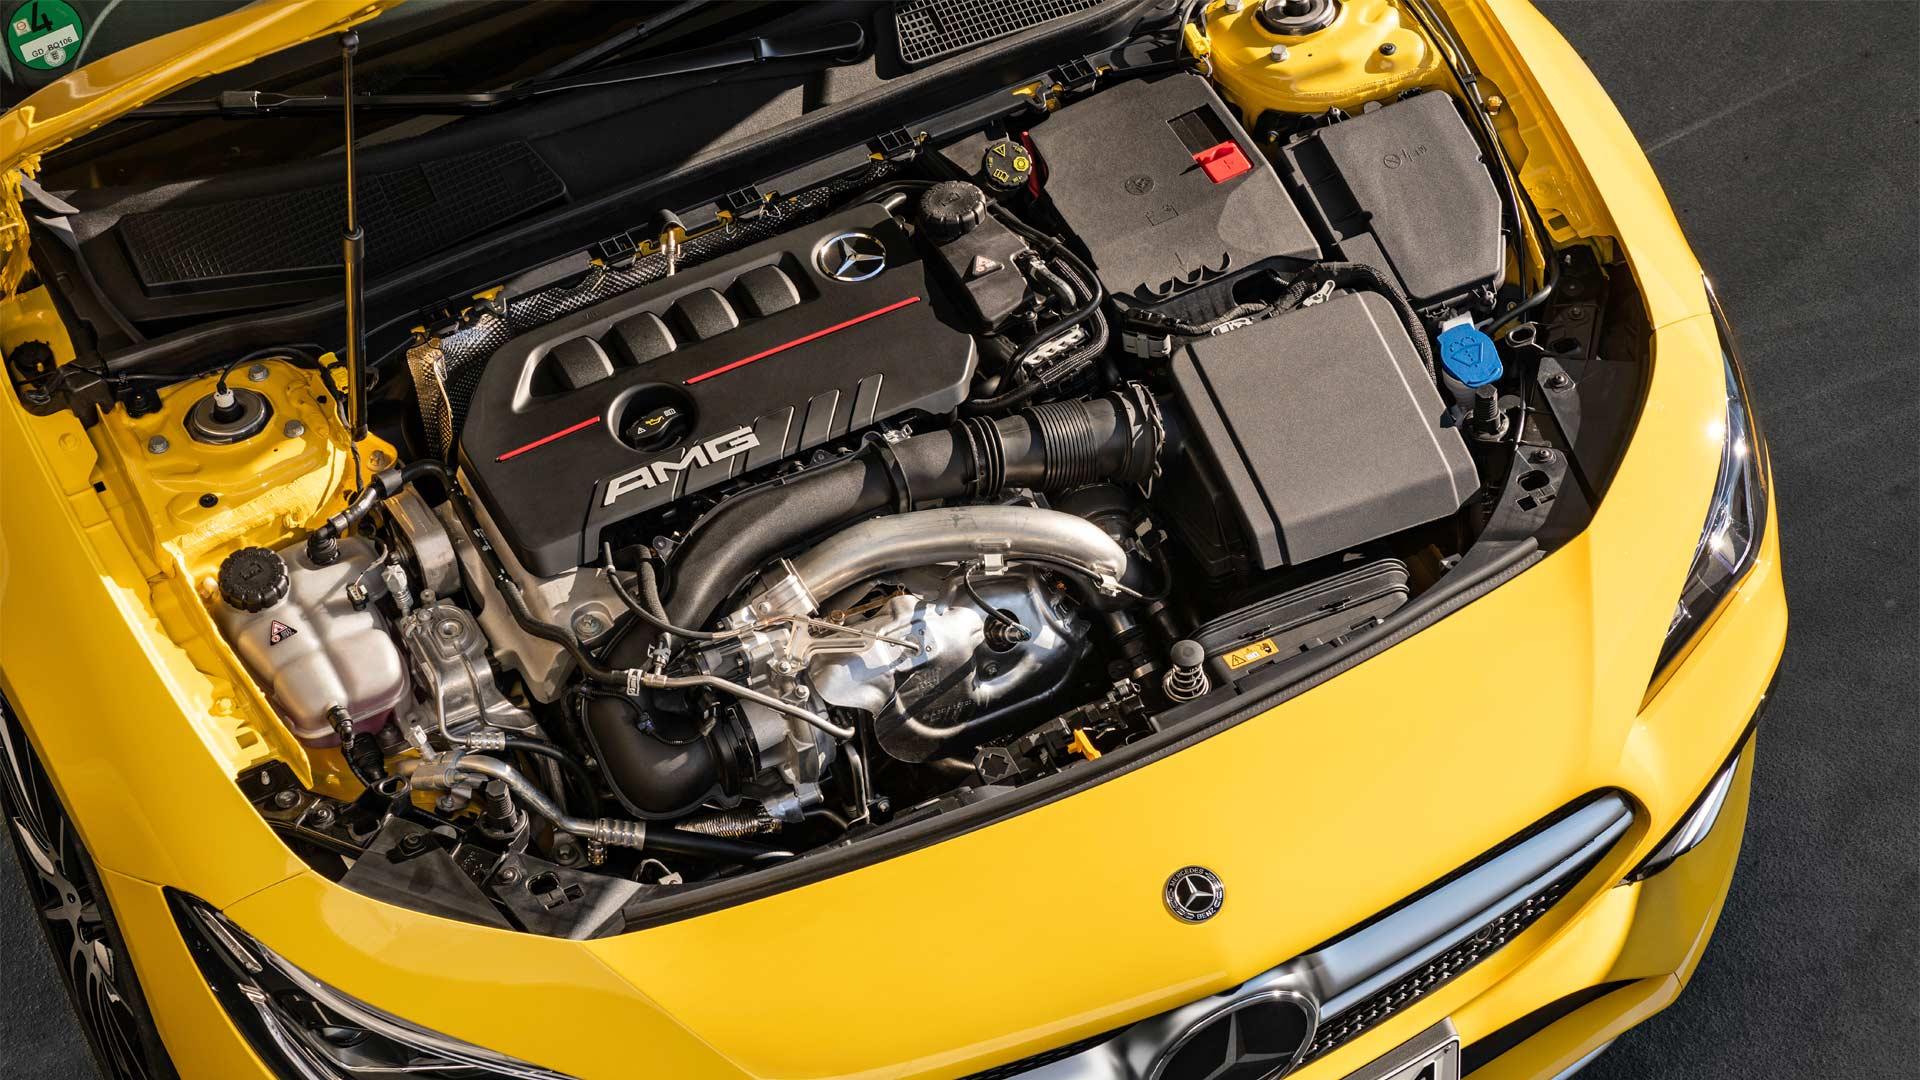 2020-Mercedes-AMG-CLA-35-4Matic-Engine